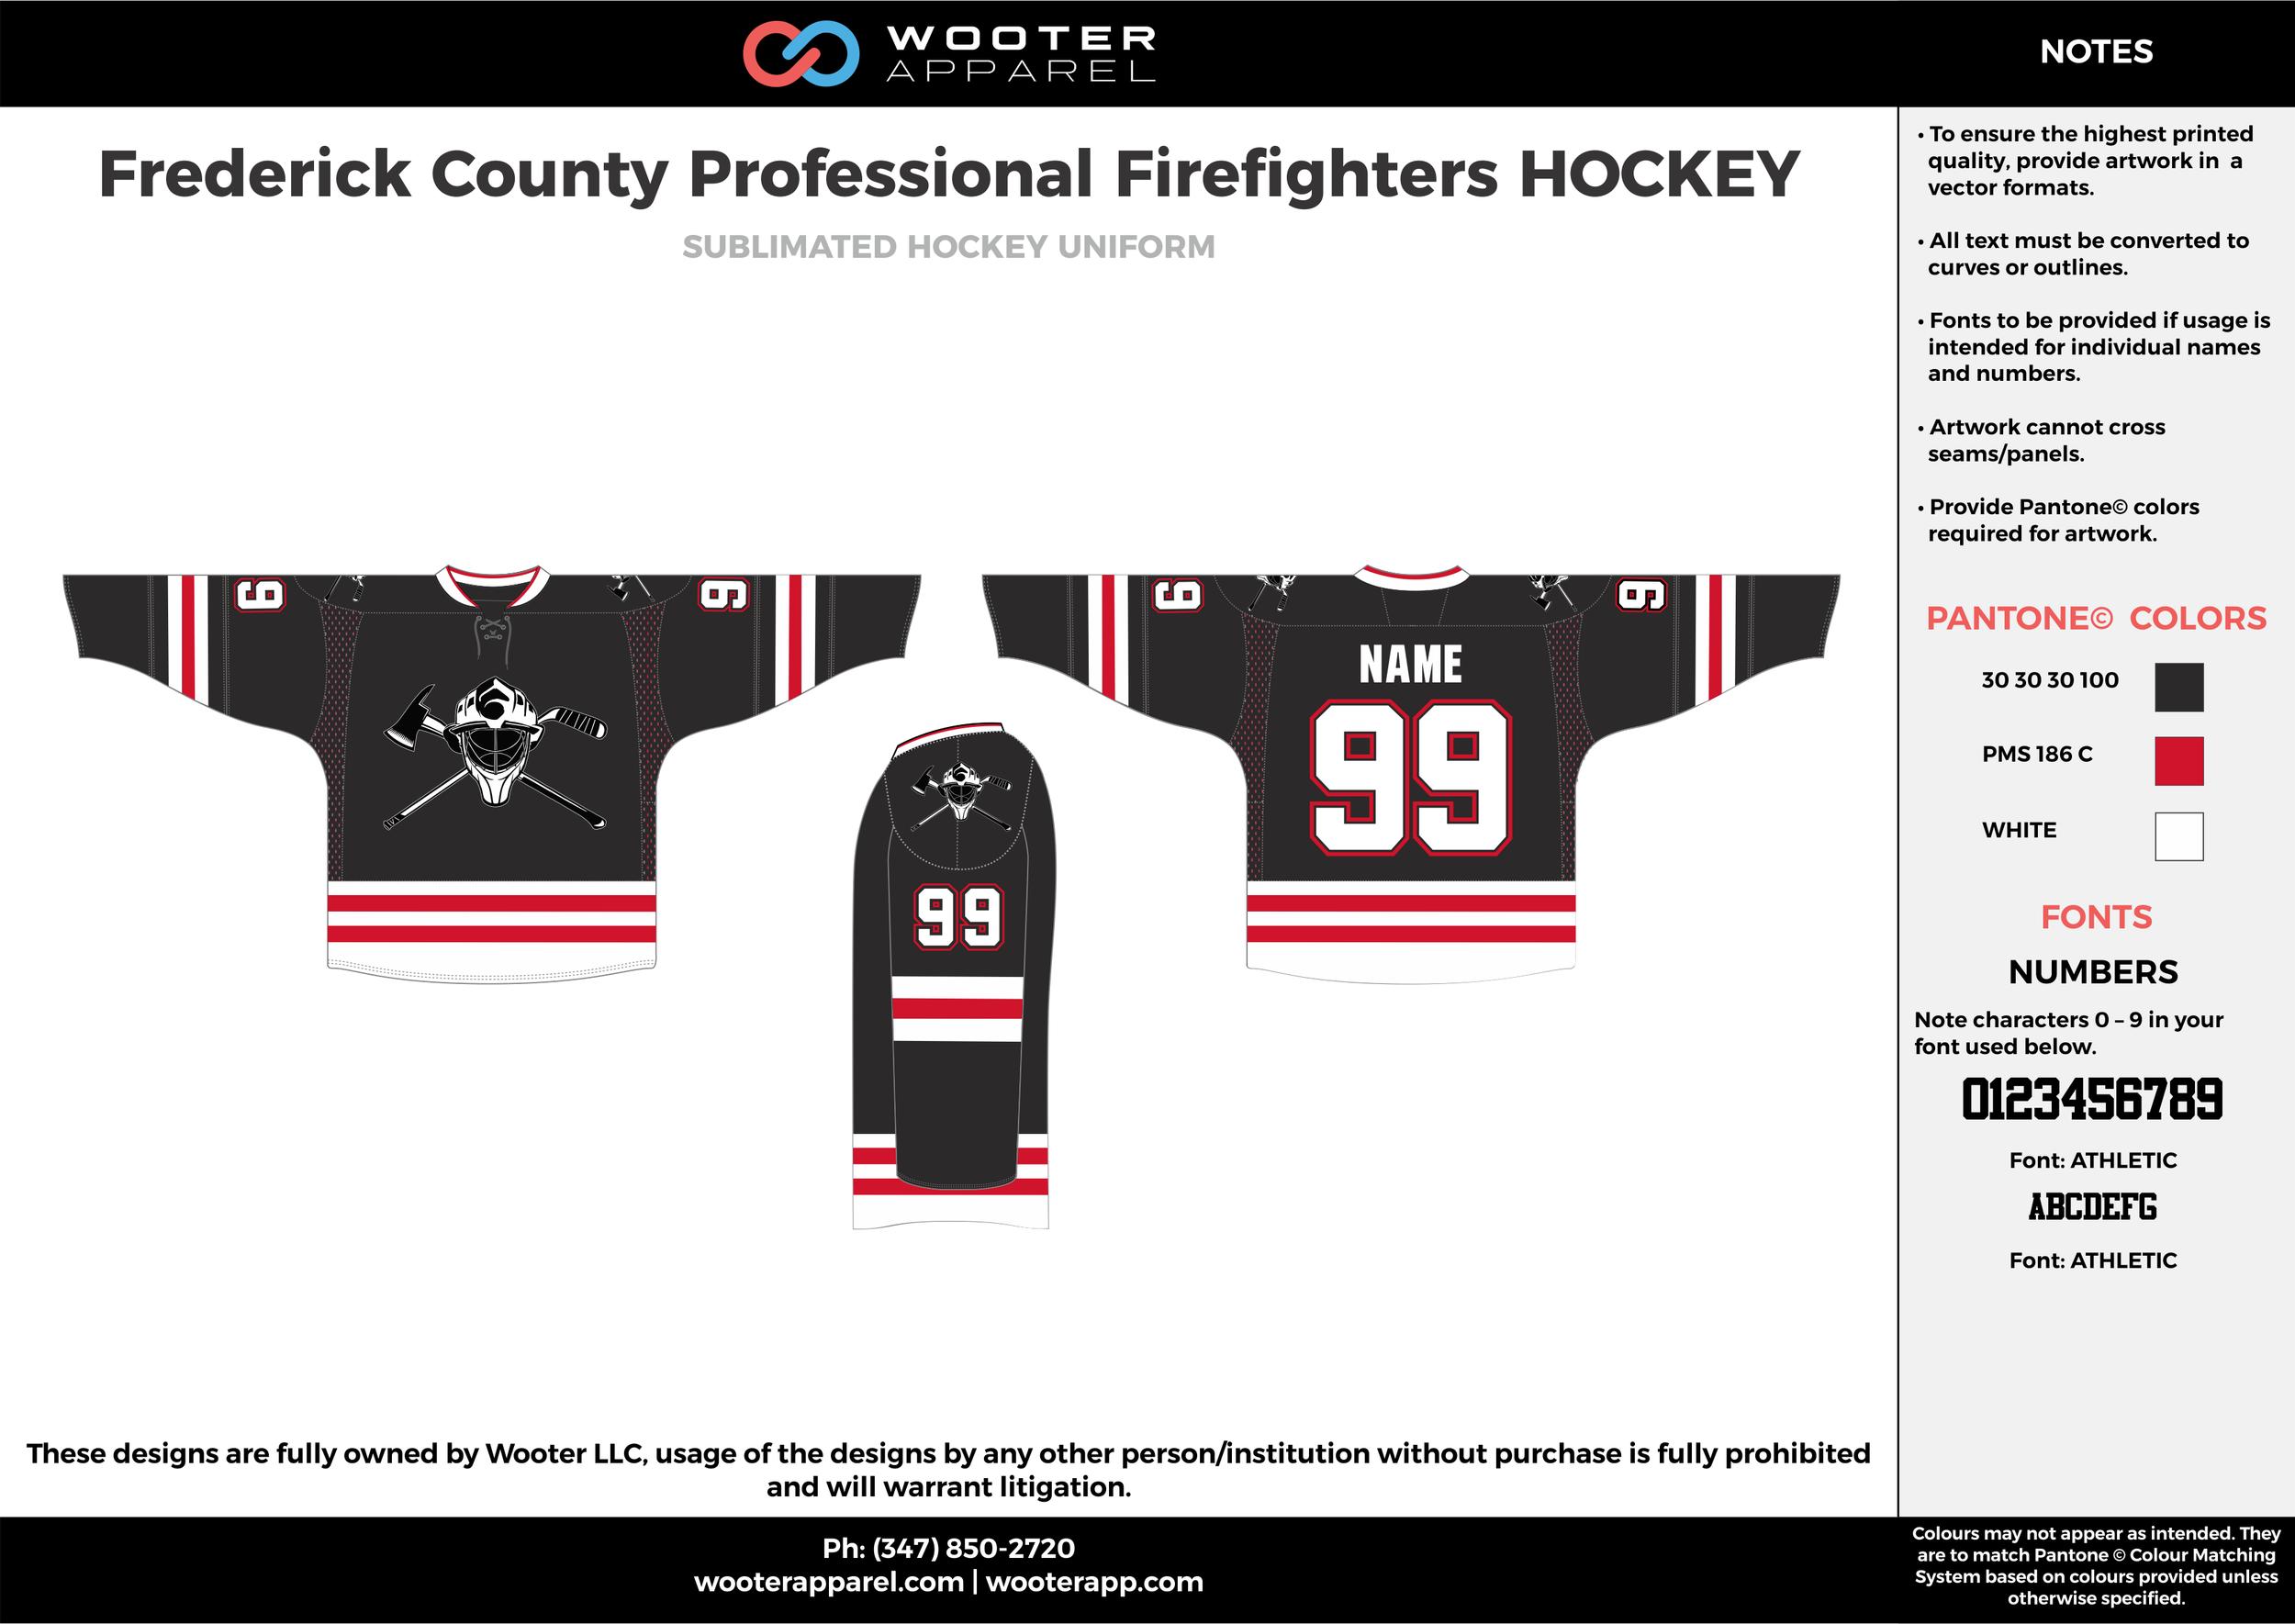 Frederick County Professional Firefighters HOCKEY black red white hockey uniforms jerseys socks